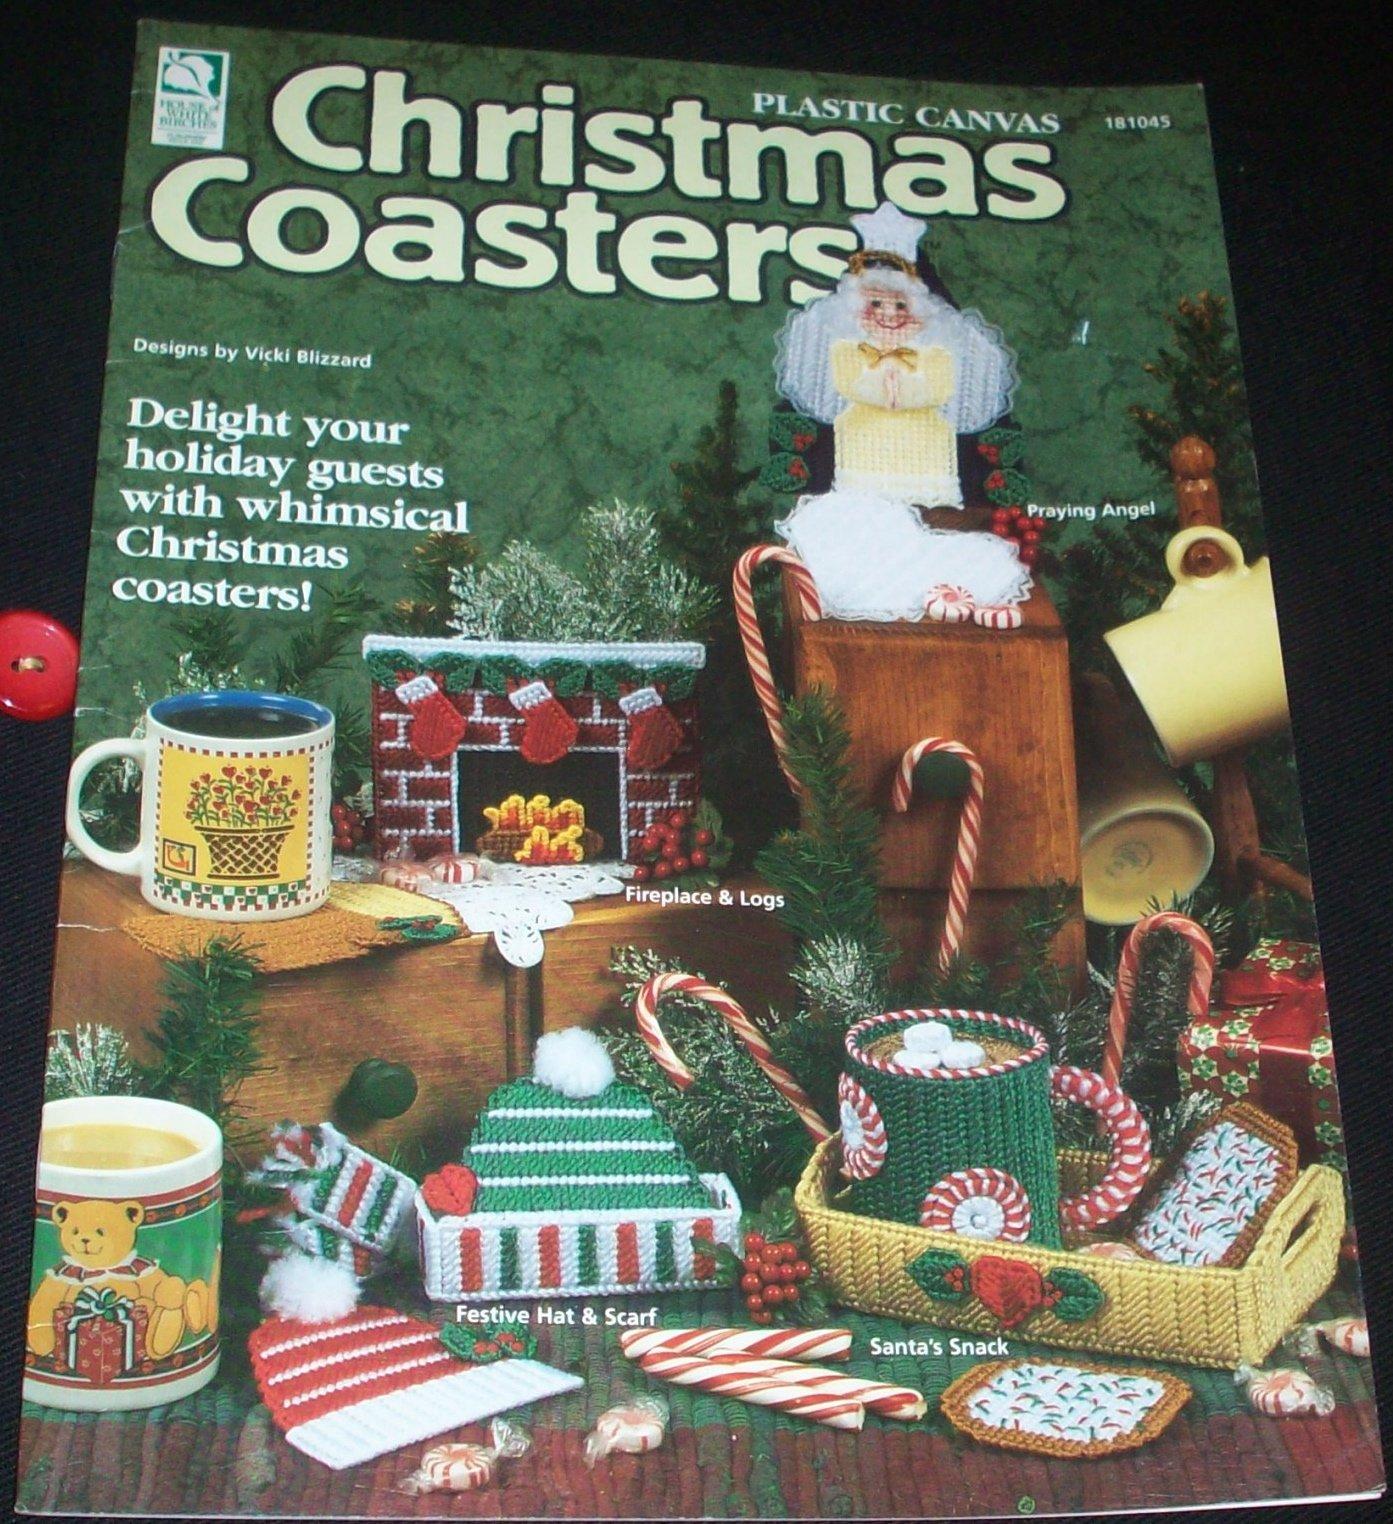 Plastic Canvas Christmas Coaster Patterns.Plastic Canvas Christmas Coasters 181045 Vicki Blizzard